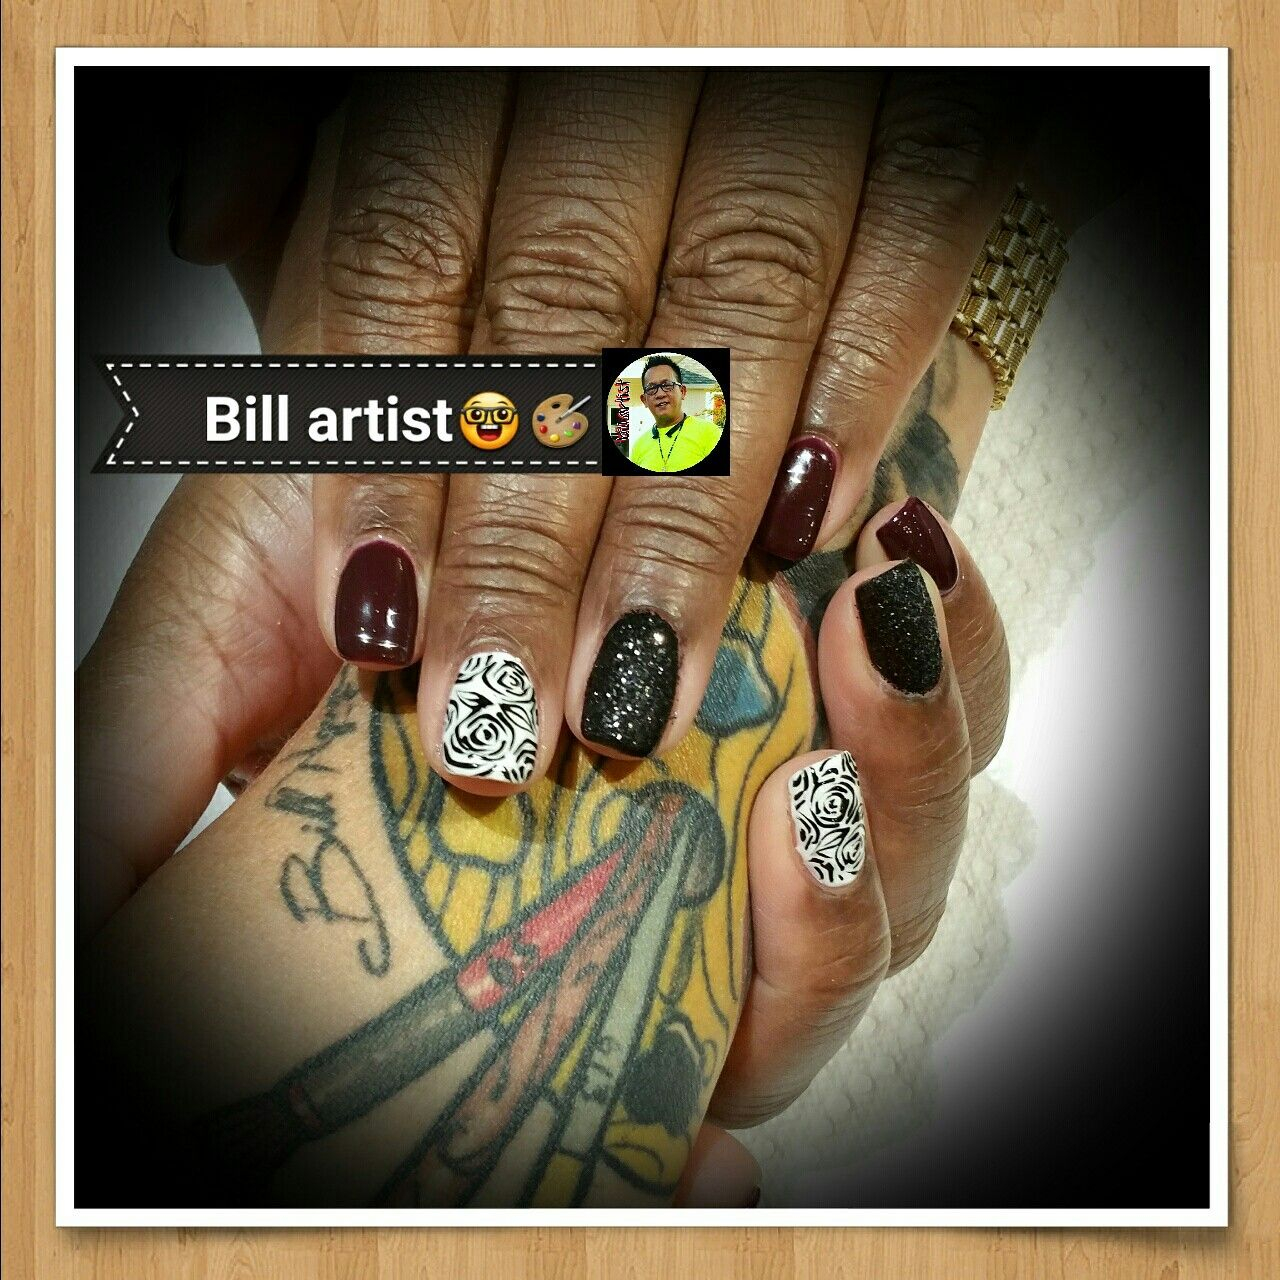 ##bill_cali#billdesign#billartist###